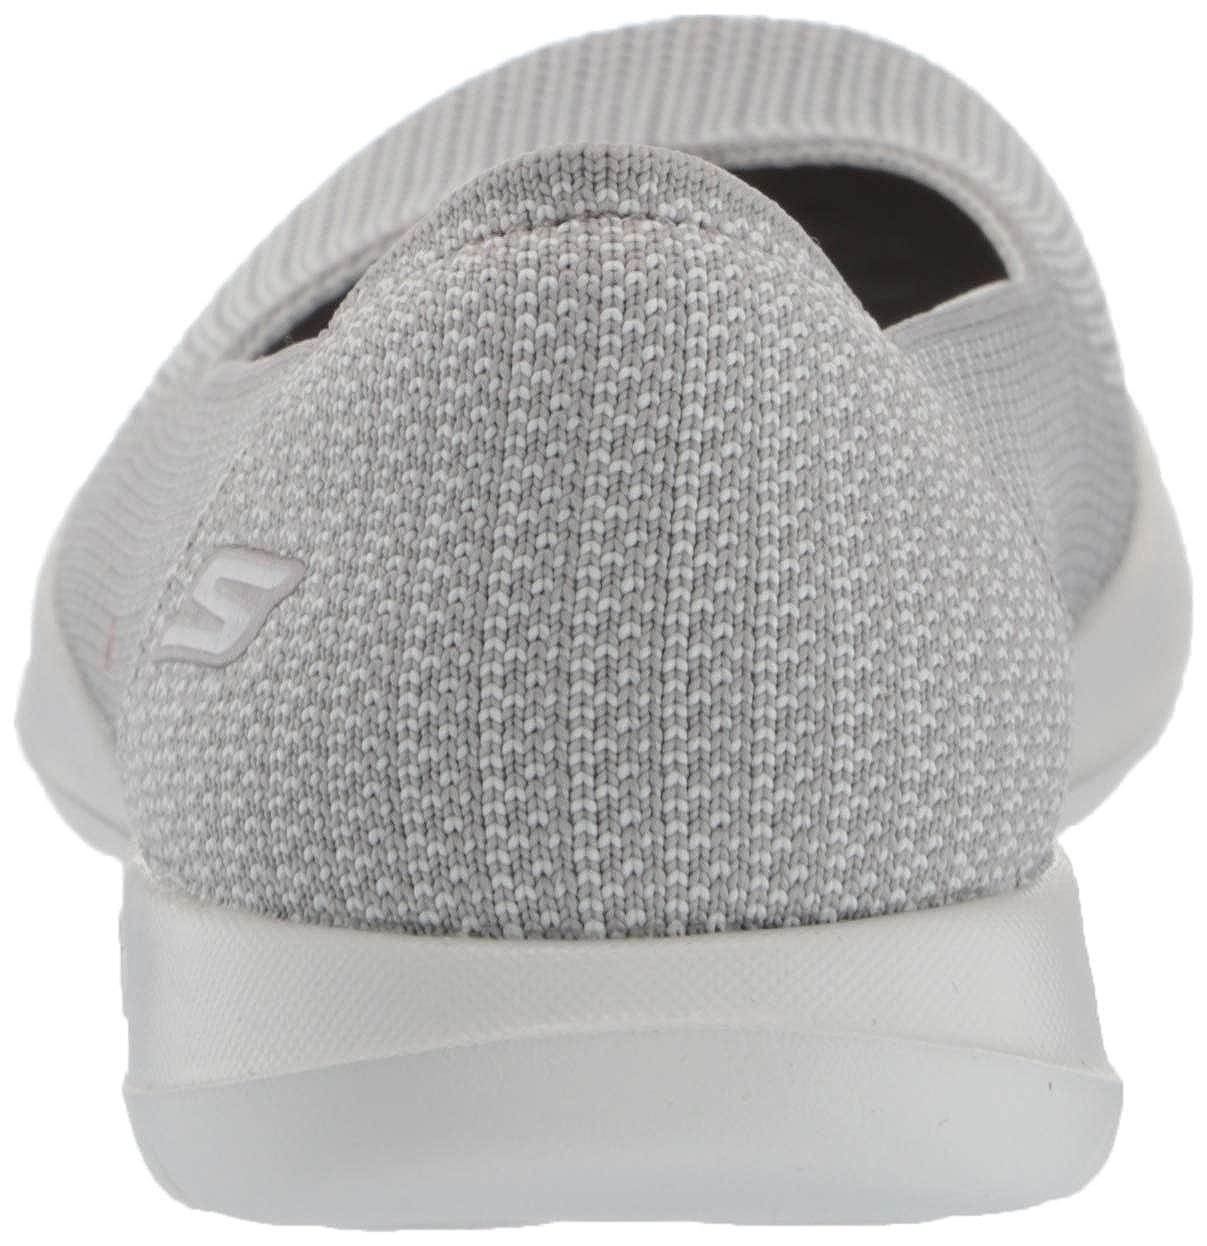 Skechers Frauen Flache Schuhe Grau